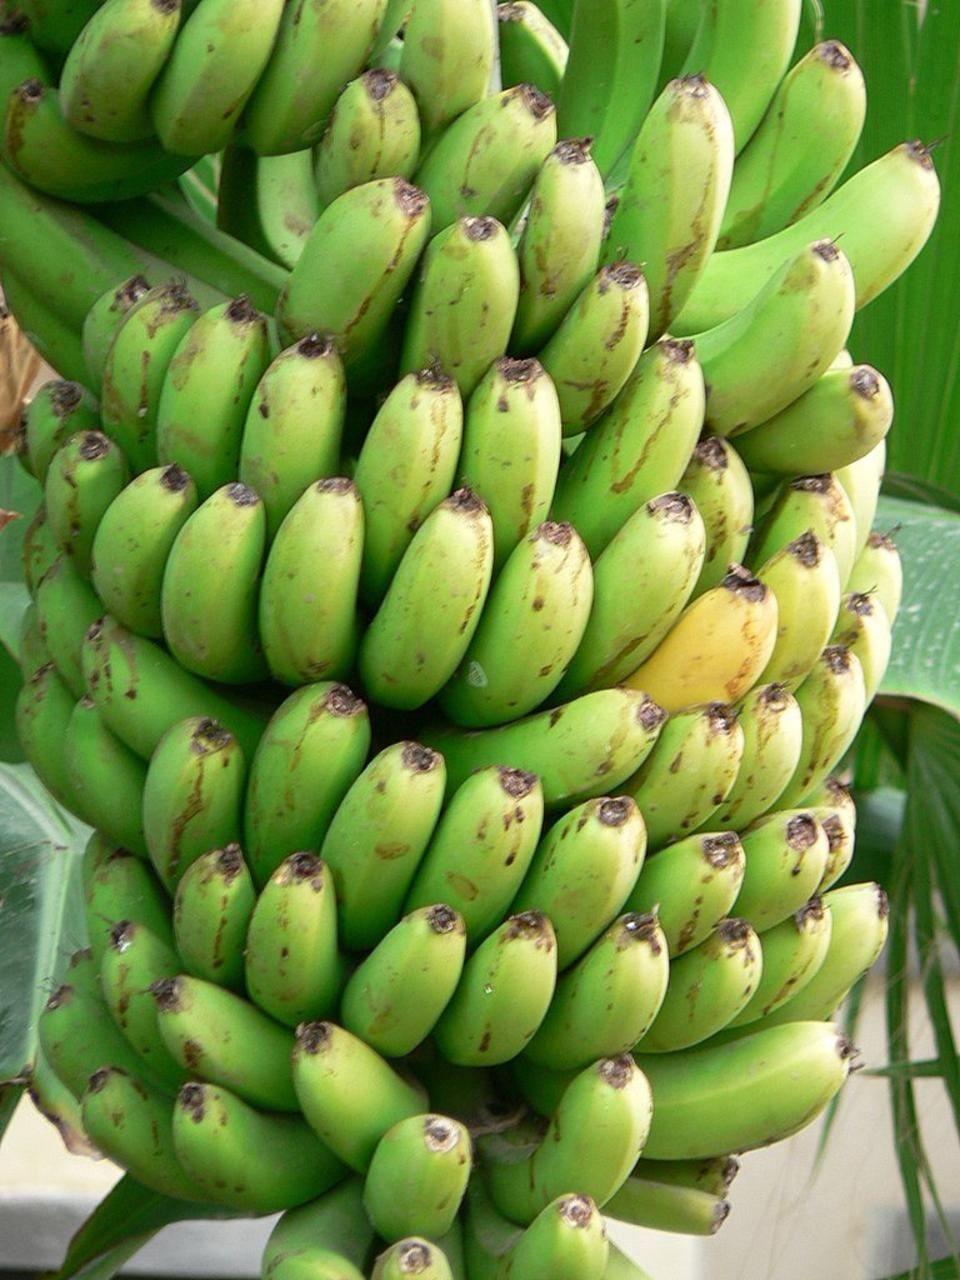 saba banana musa balbisiana peels as